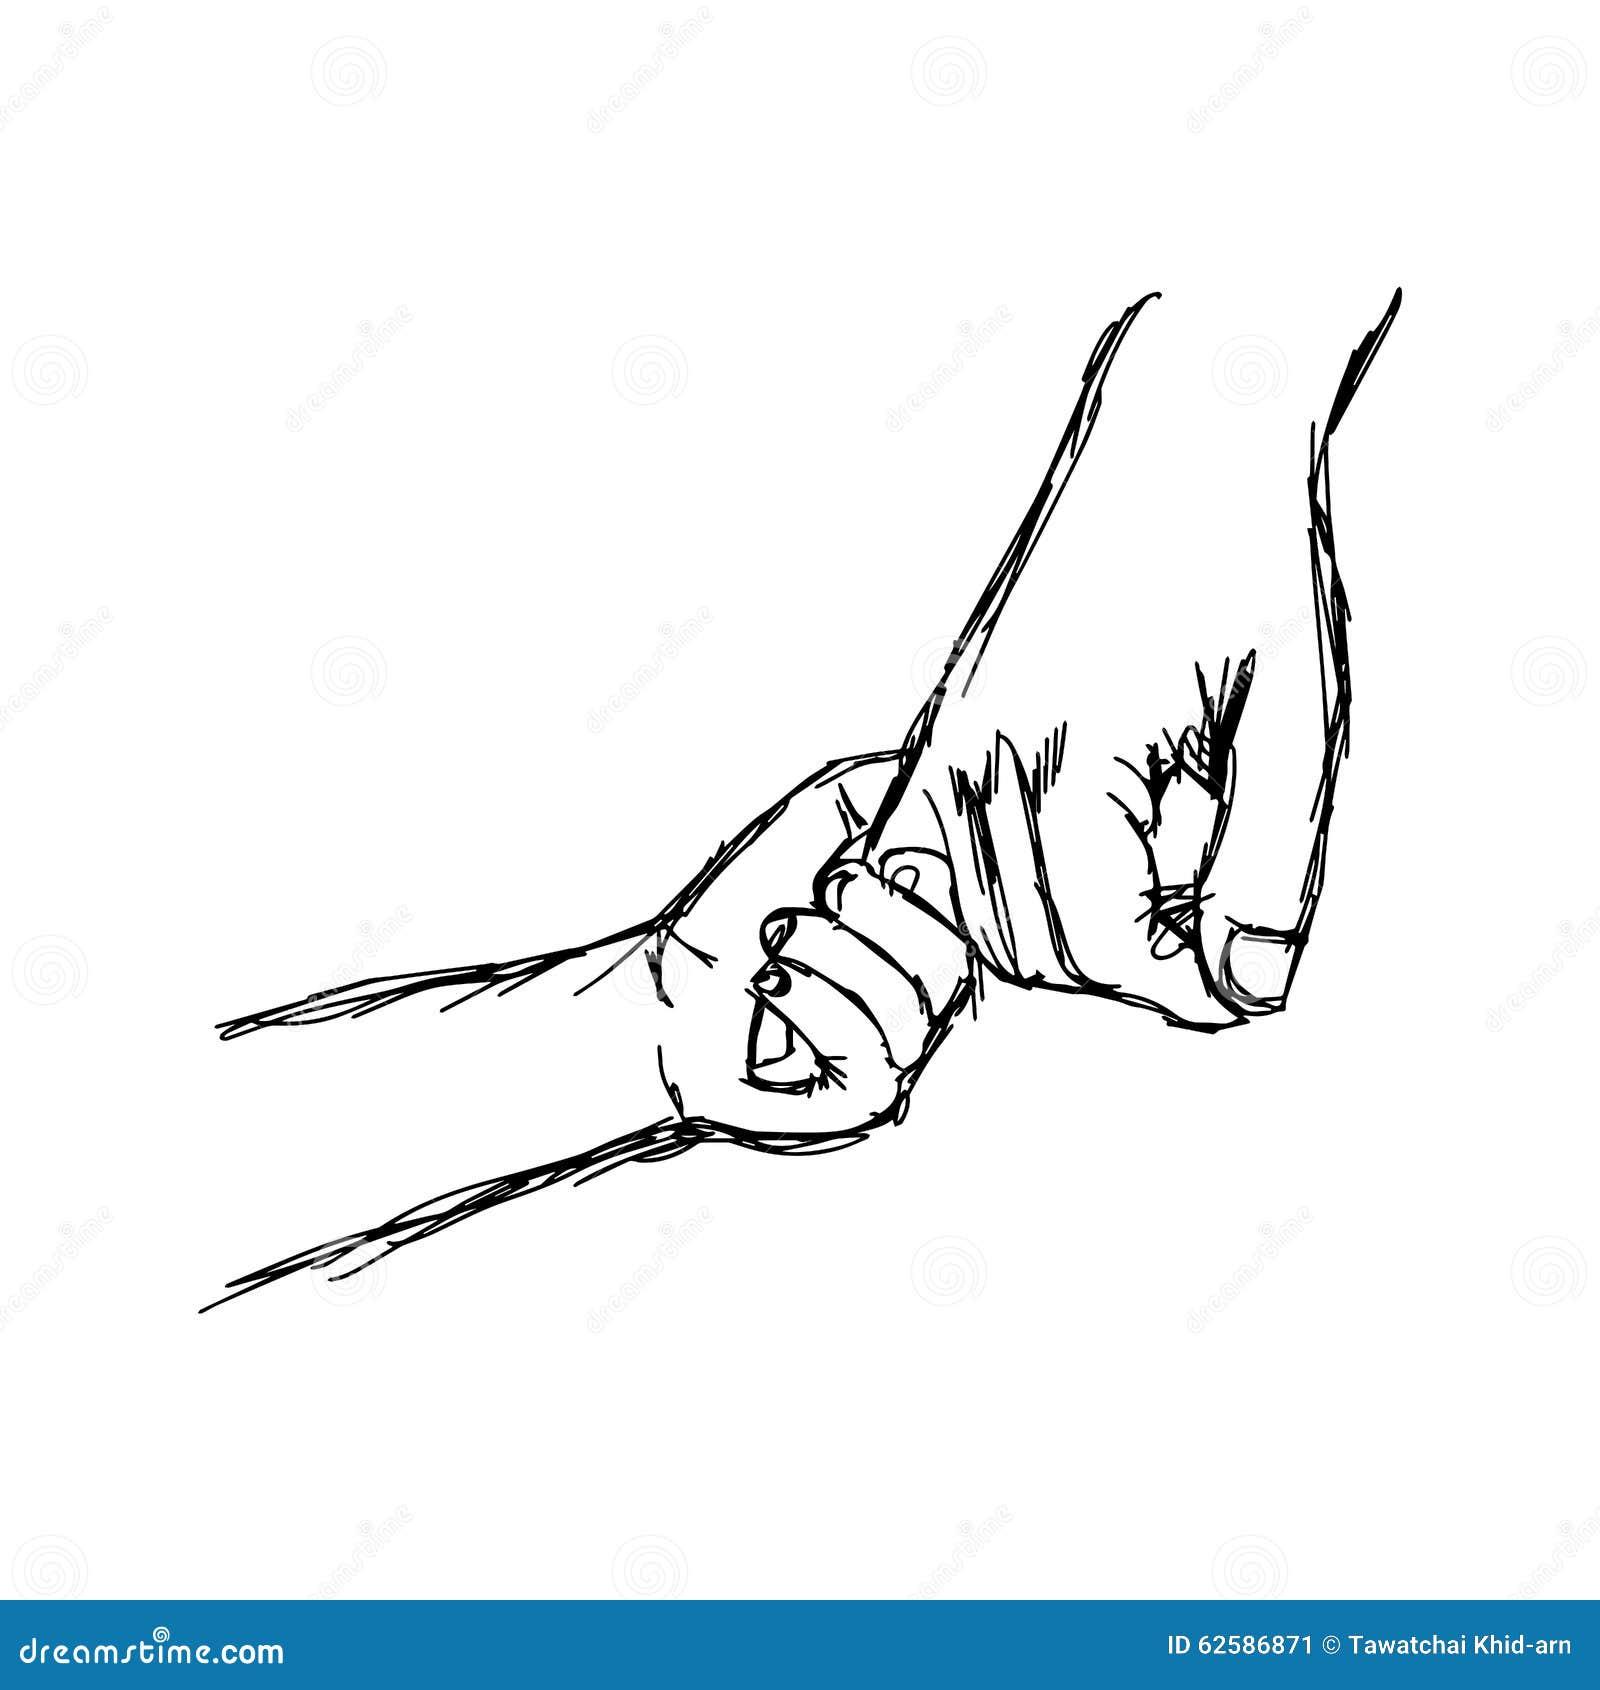 illustration vector doodle hand drawn sketch of parent Senior Citizen Clip Art clip art elderly care